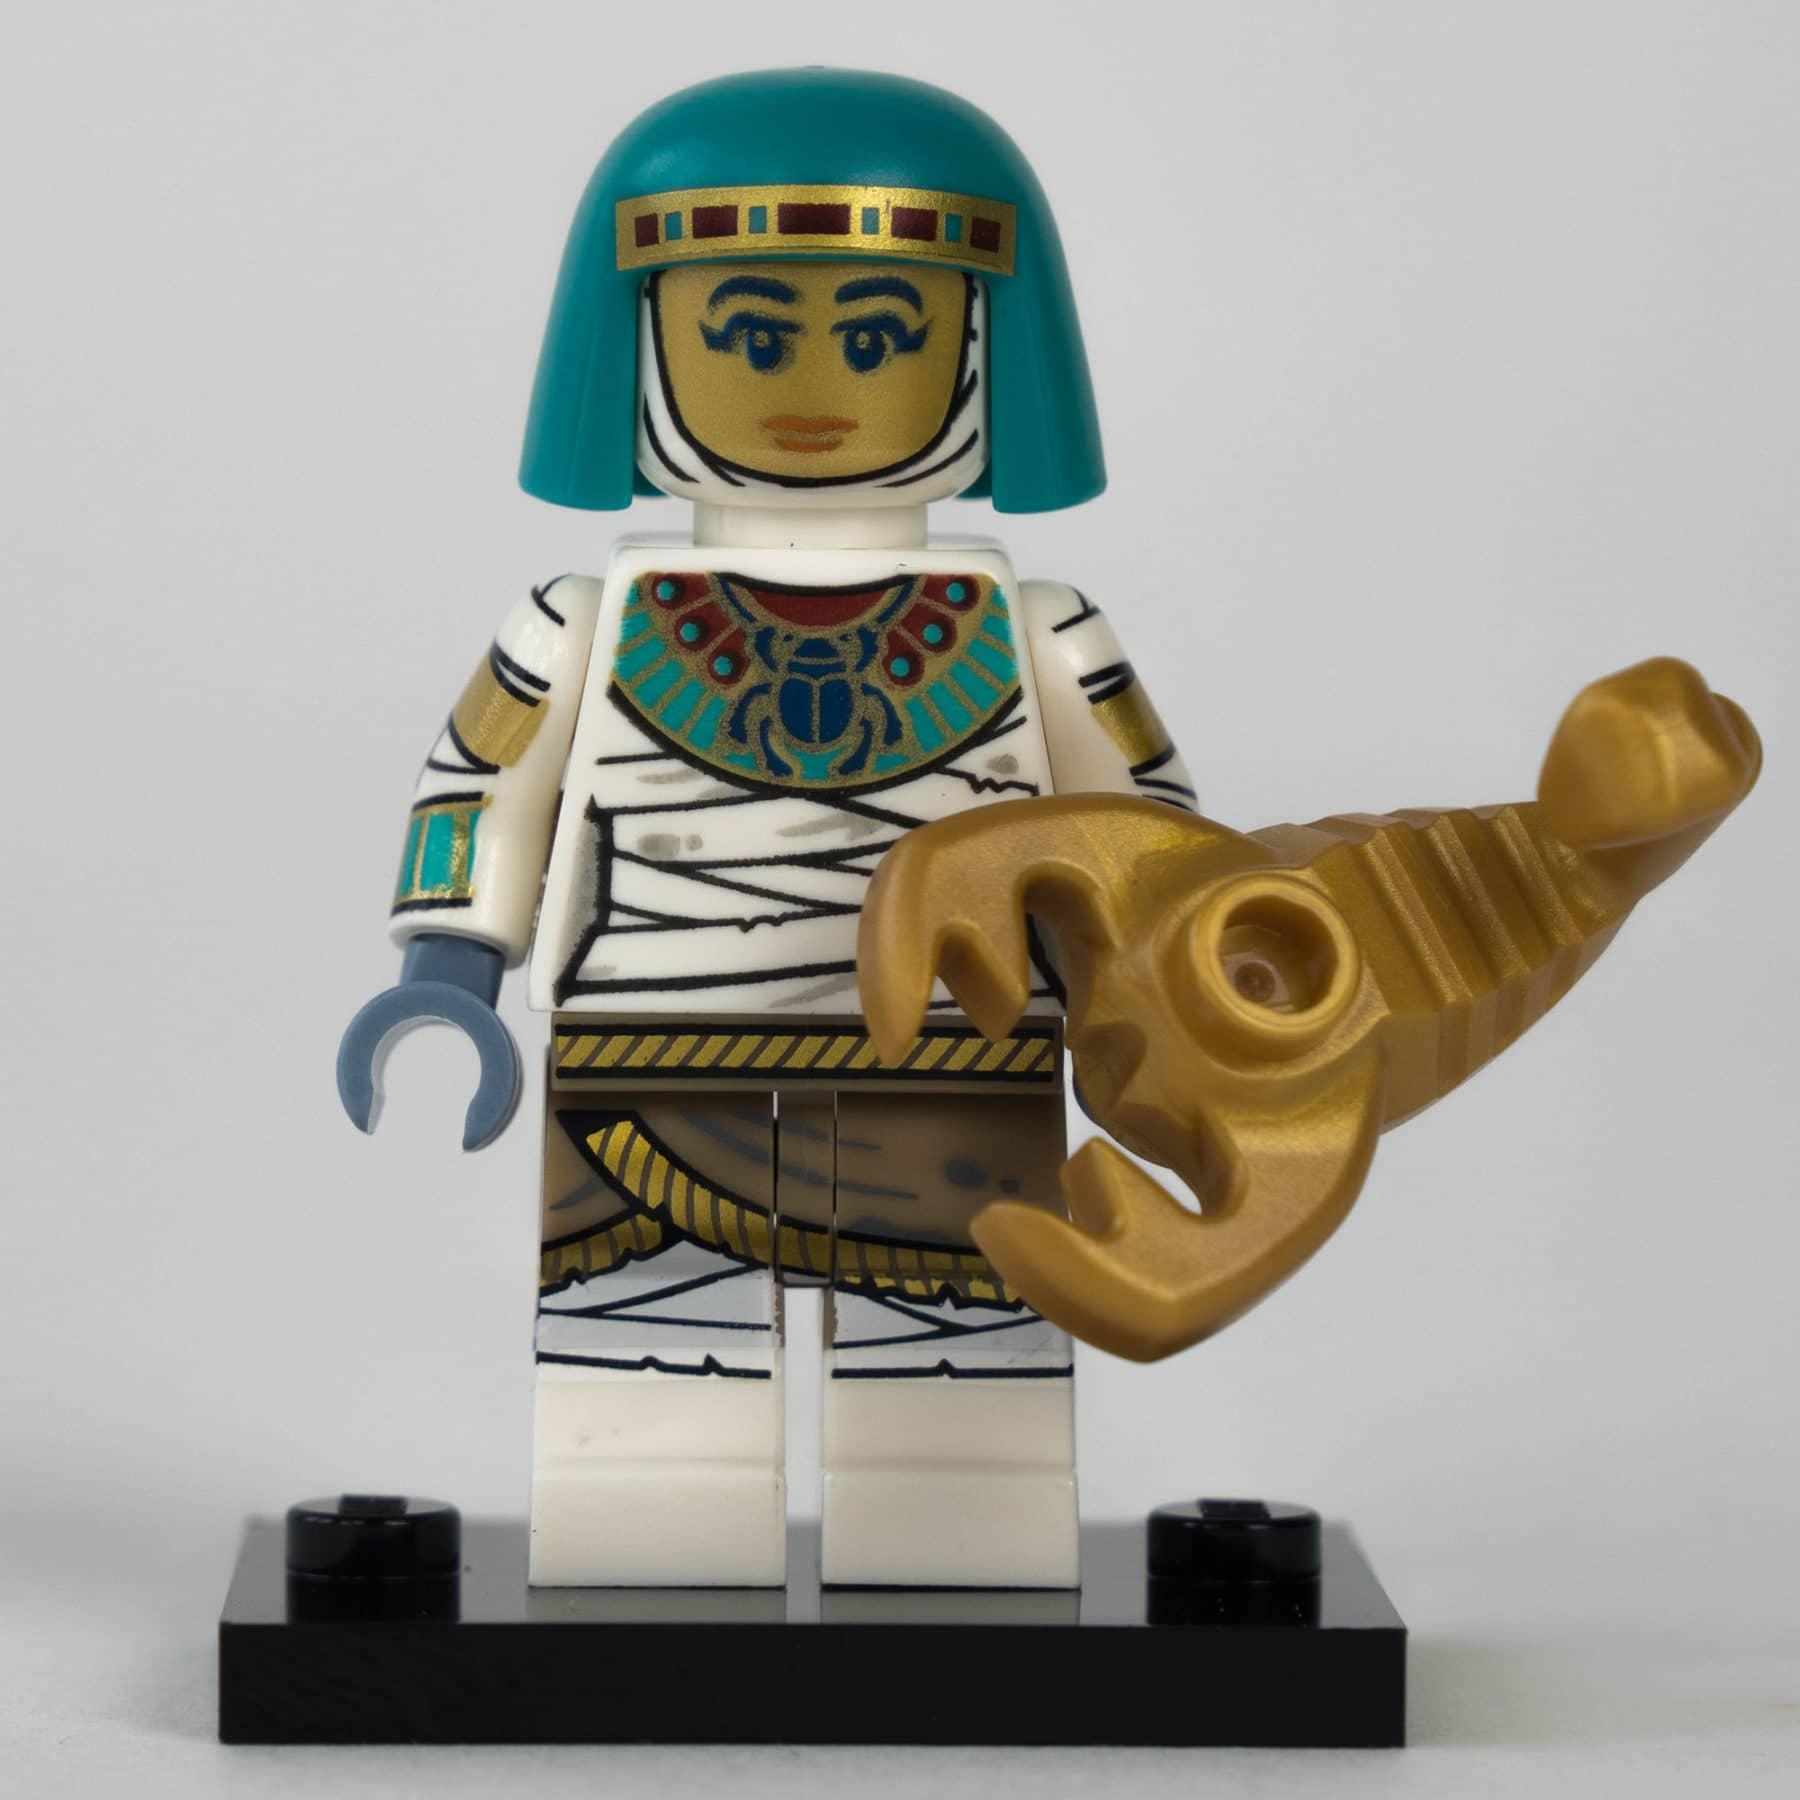 LEGO 71025 Minifigur: Mumie